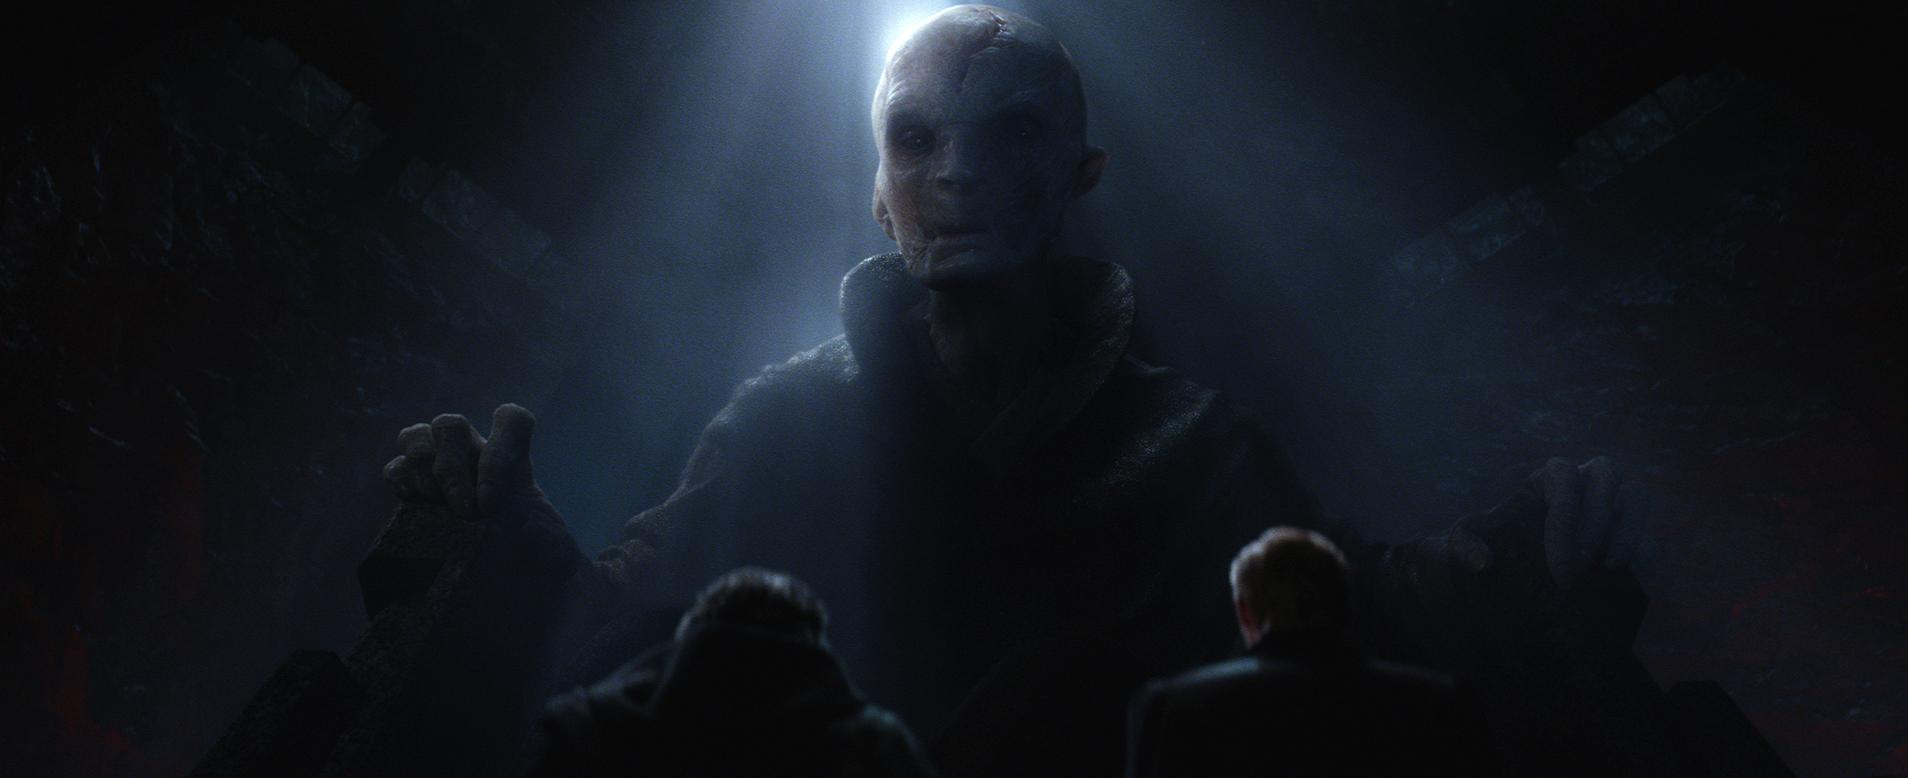 Star Wars: The Force Awakens..Supreme Leader Snoke (Andy Serkis)..Ph: Film Frame..© 2014 Lucasfilm Ltd. & TM. All Right Reserved..